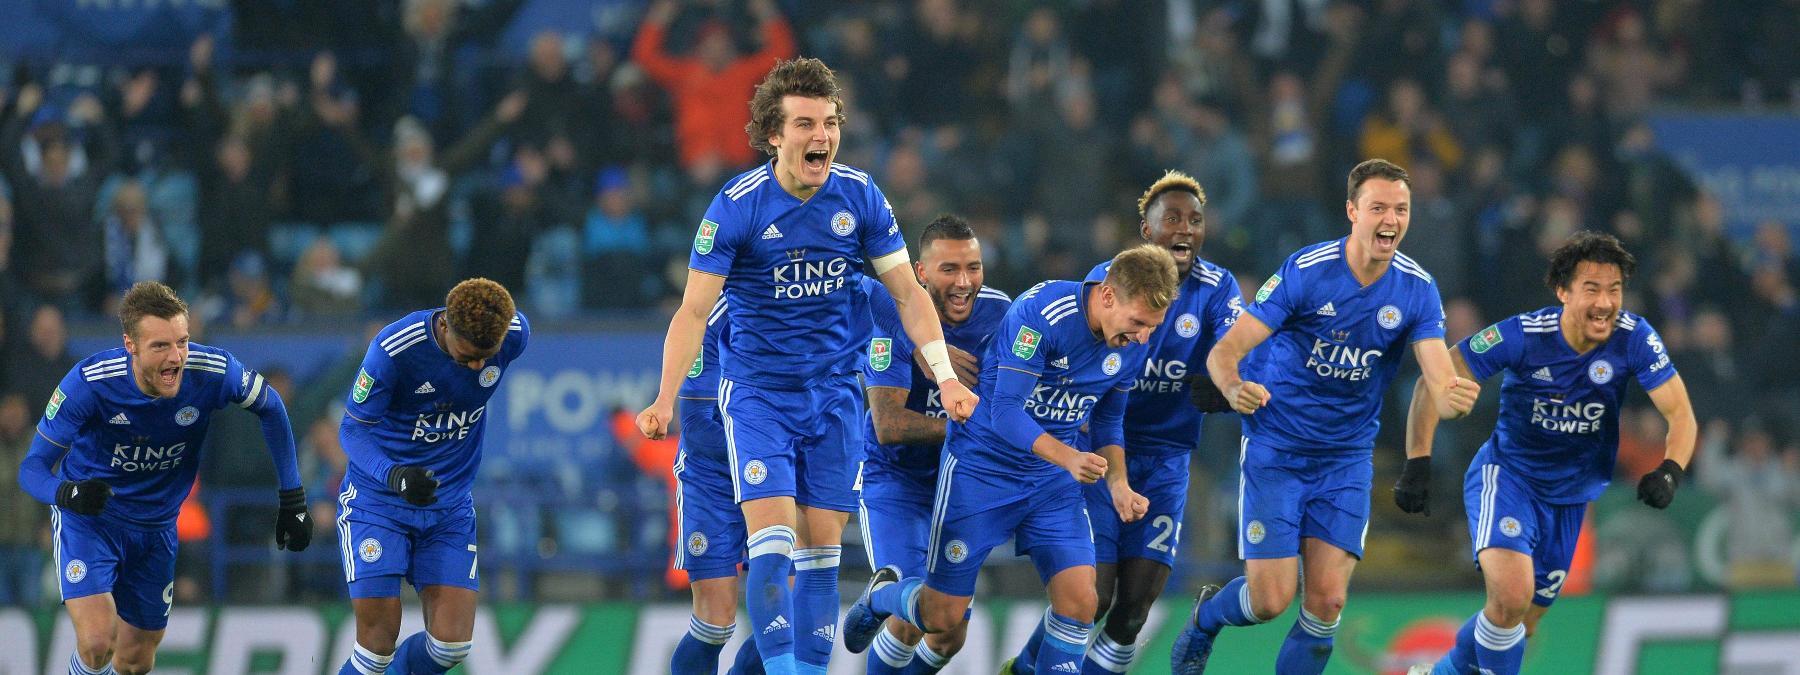 City Defeat Southampton On Penalties